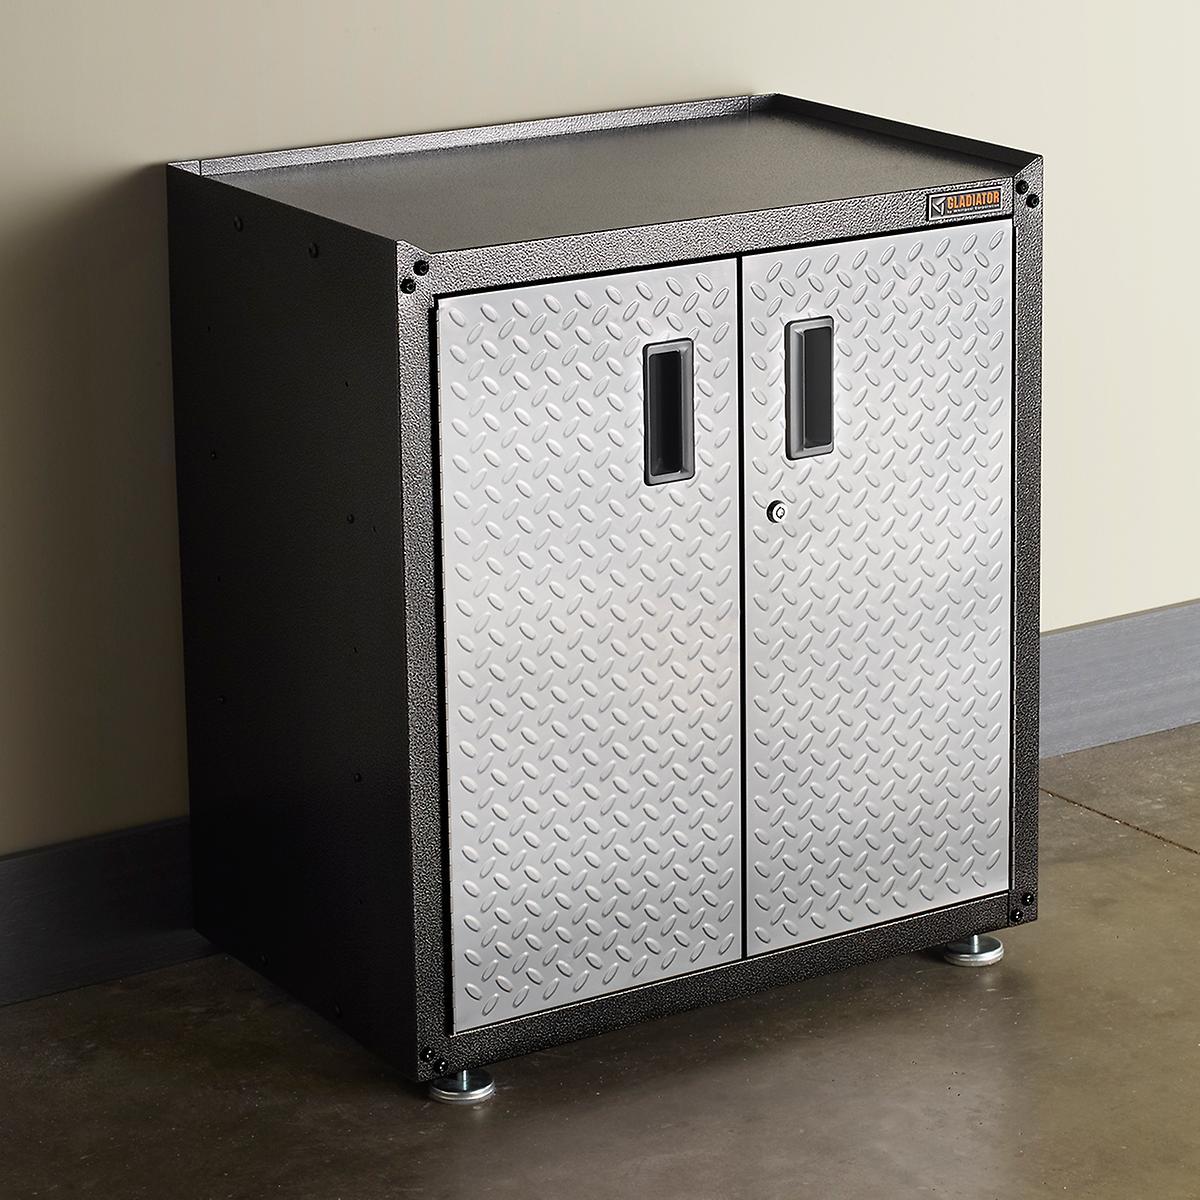 Gladiator Silver Tread Full-Door Modular GearBox